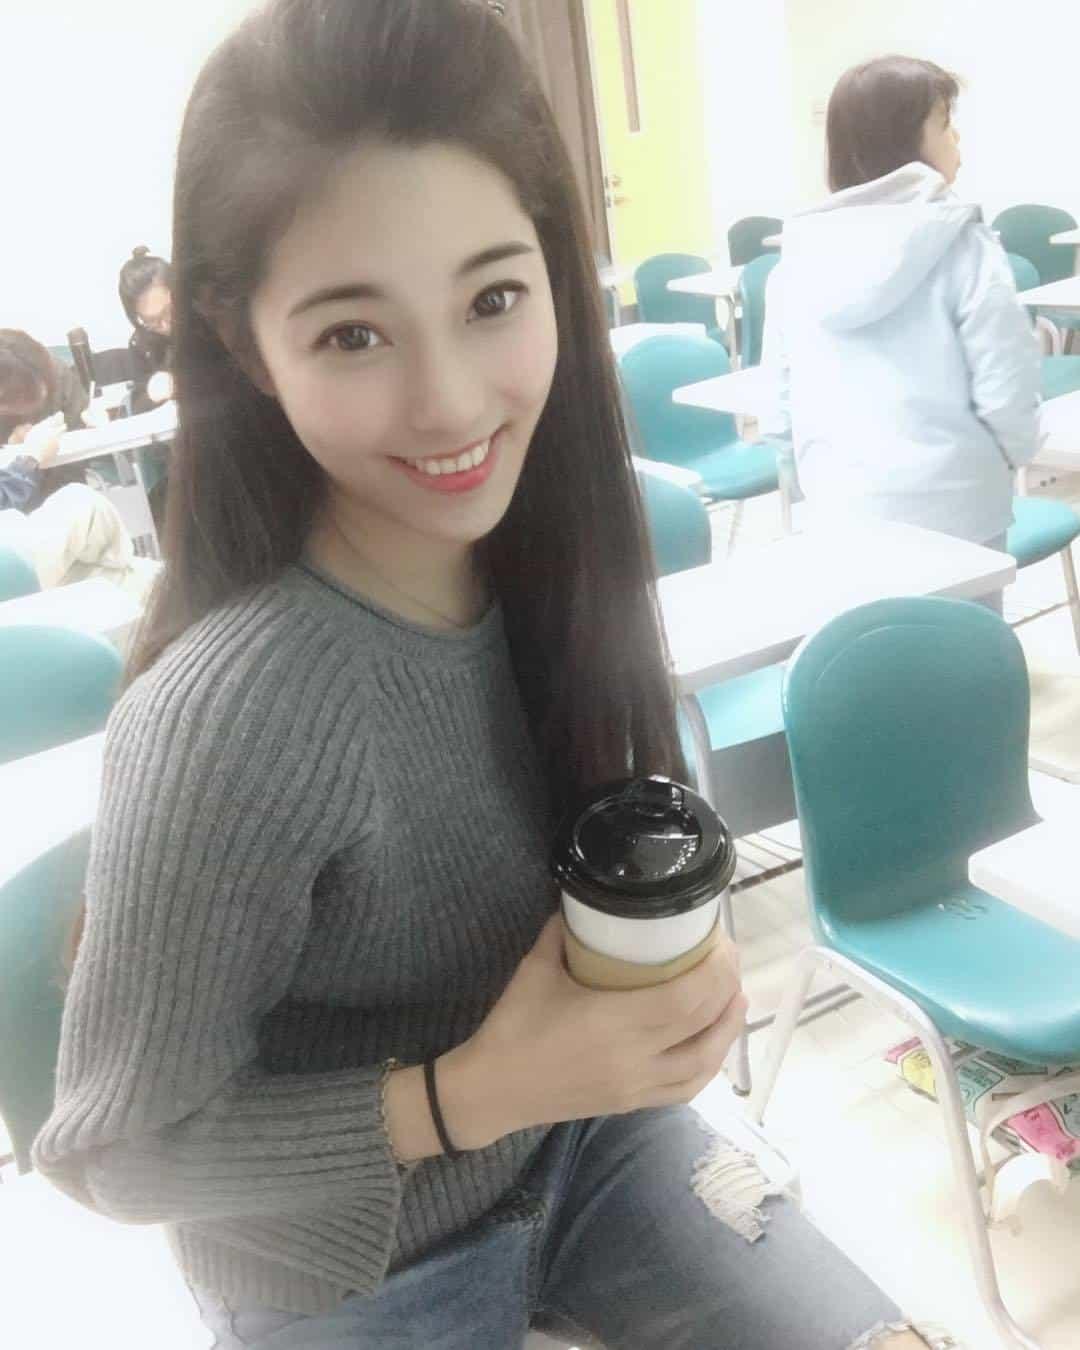 ⓒ hiawen.cheng 인스타그램